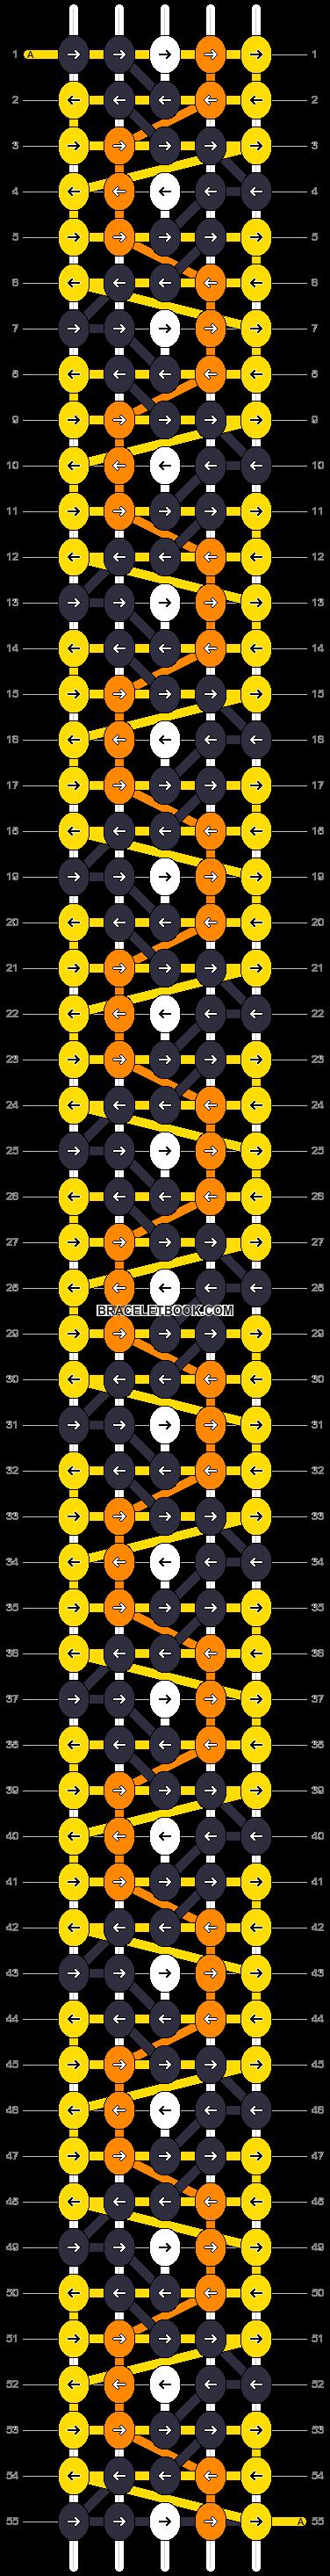 Alpha pattern #16172 pattern